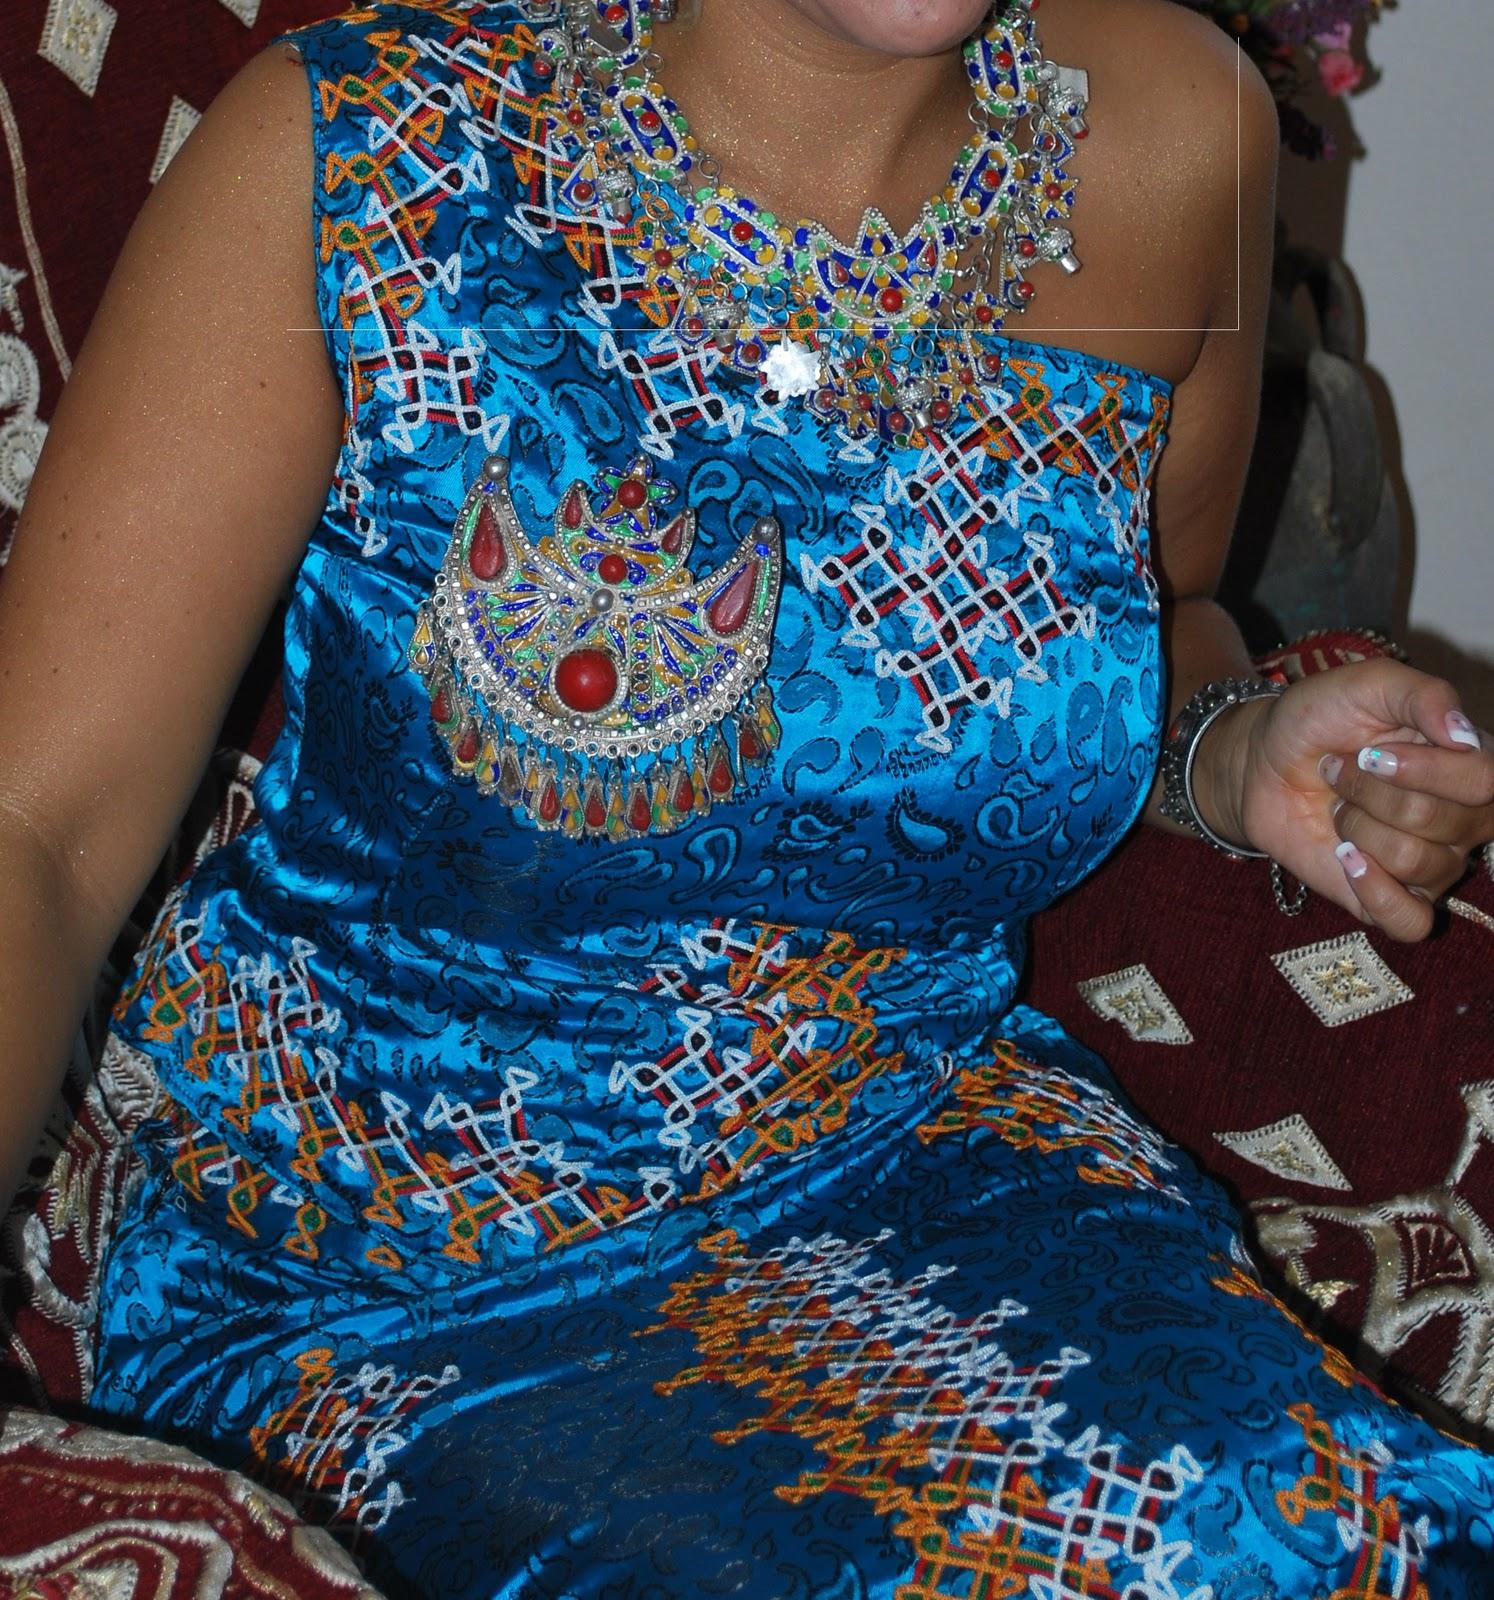 pin robes algerienne traditionnelle 2012 26082012 fruski board on